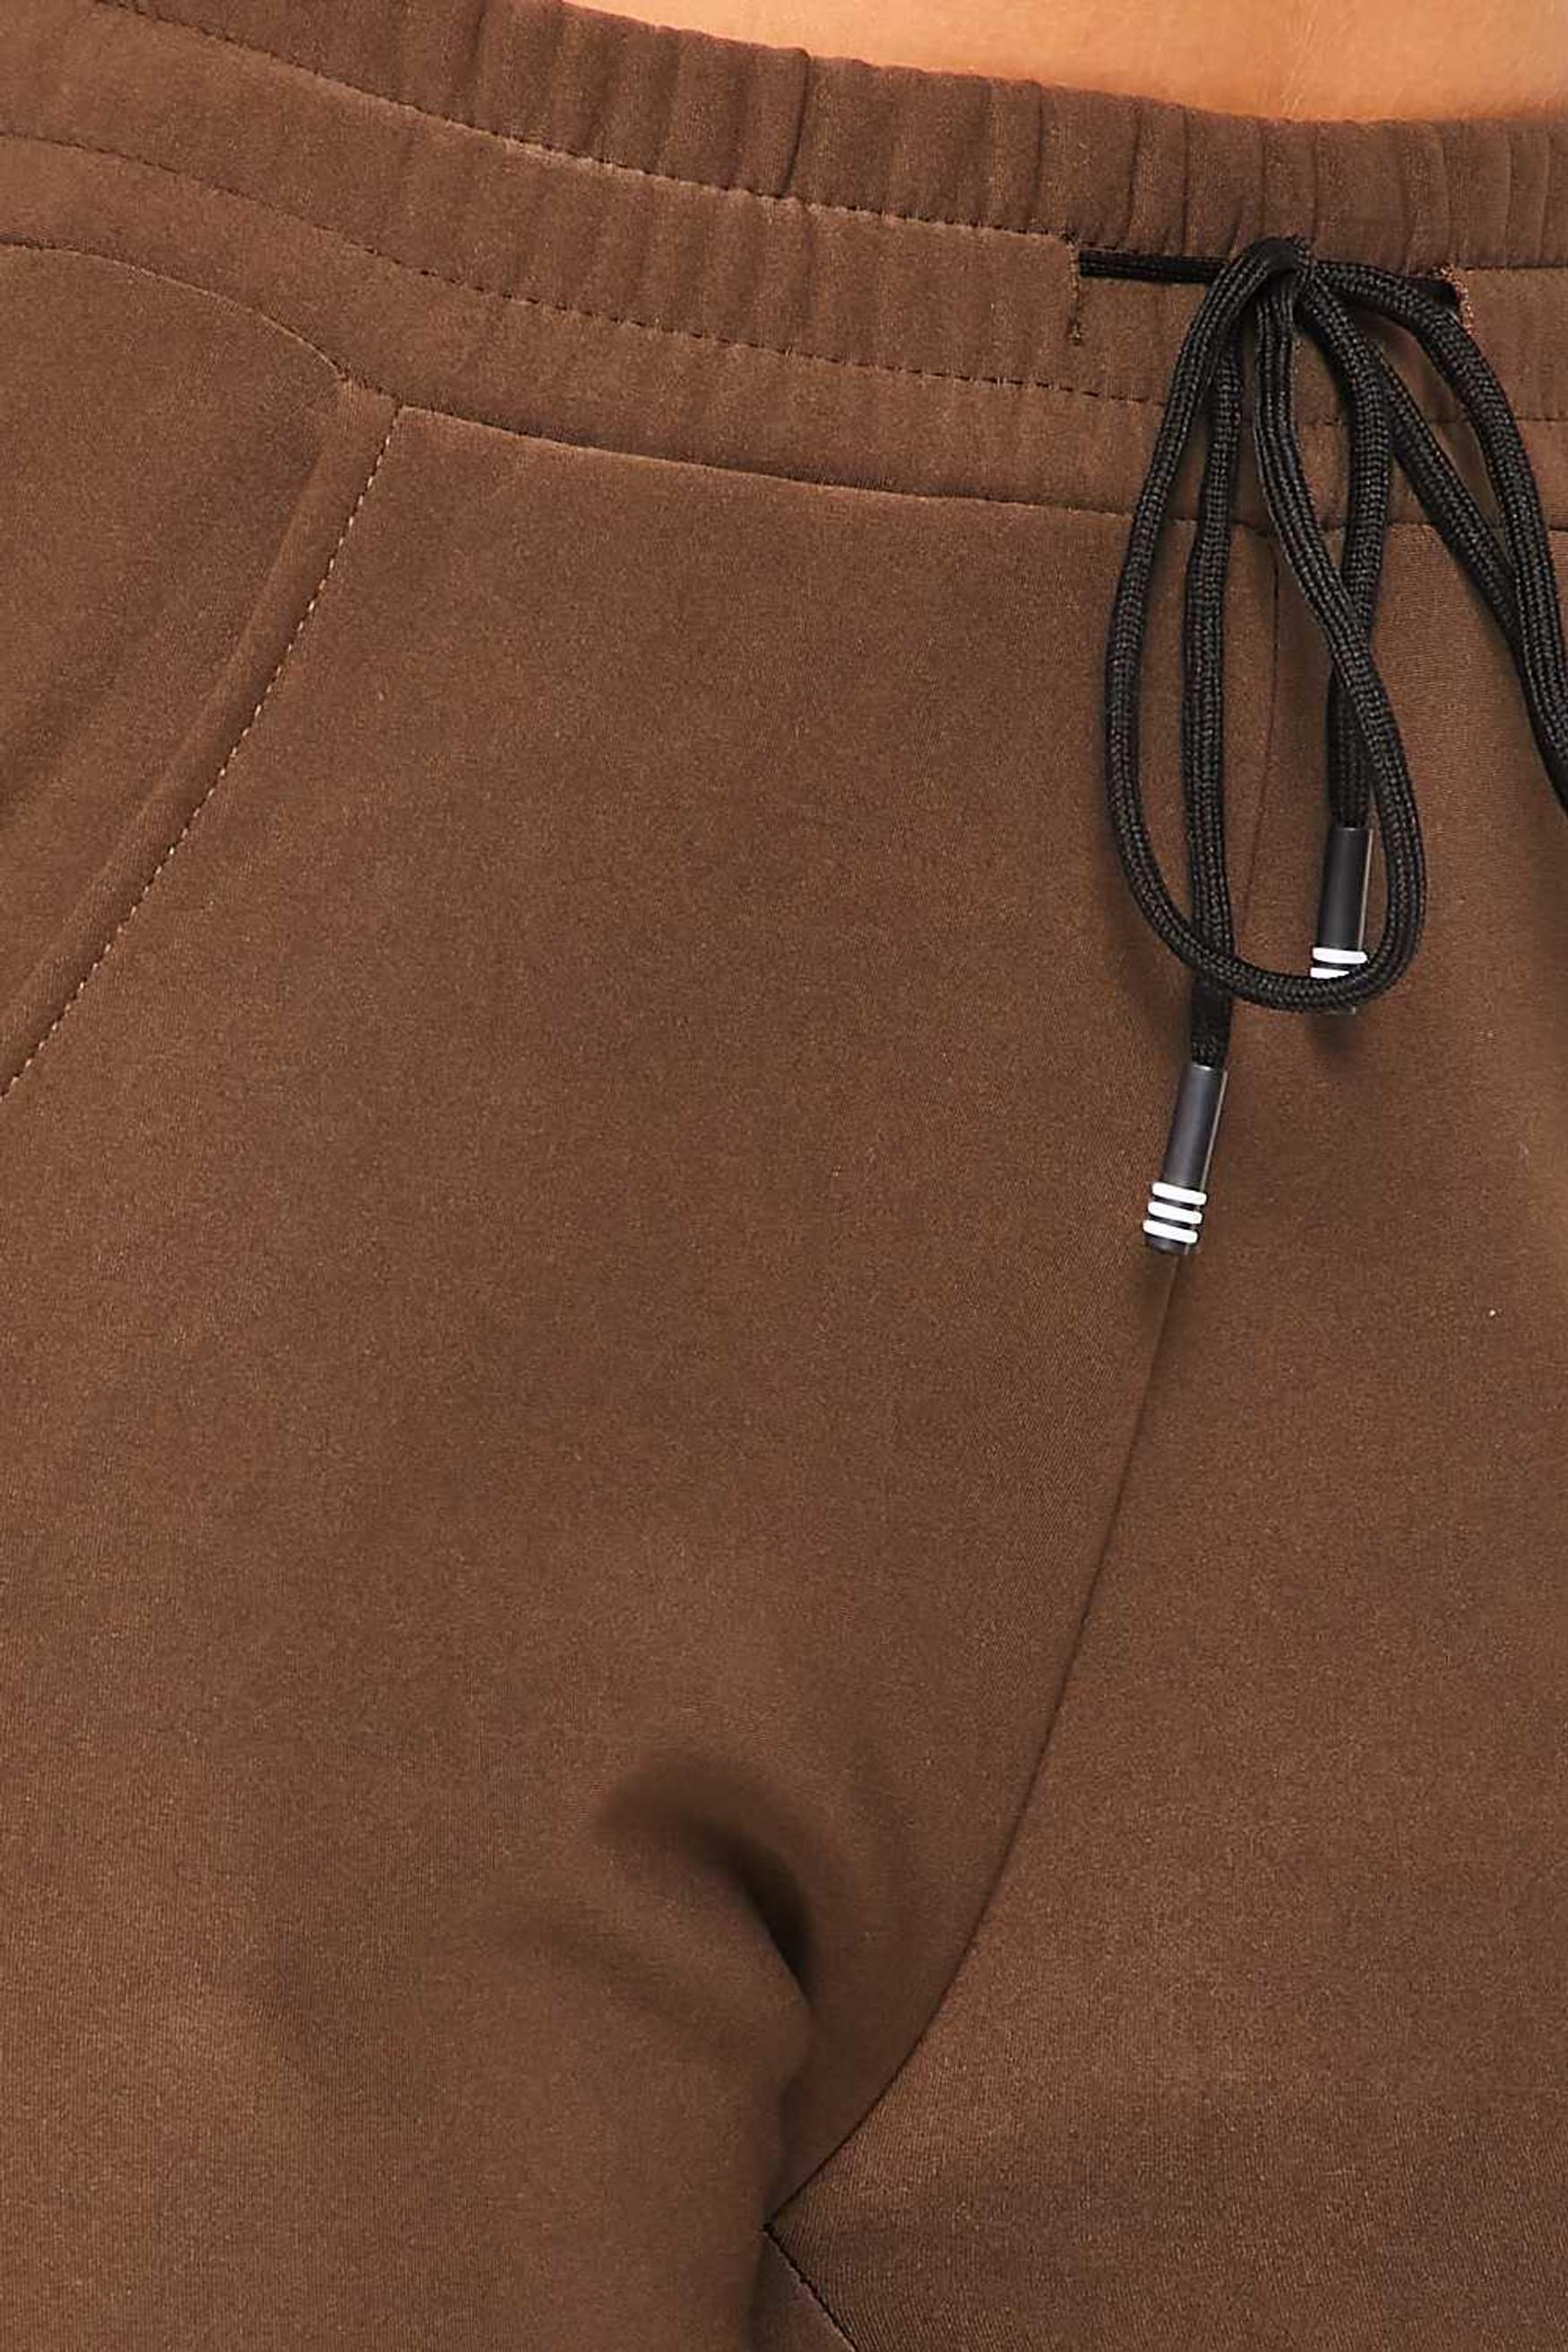 Solid Fur Lined Jogger Pocket Zipper & Drawstring